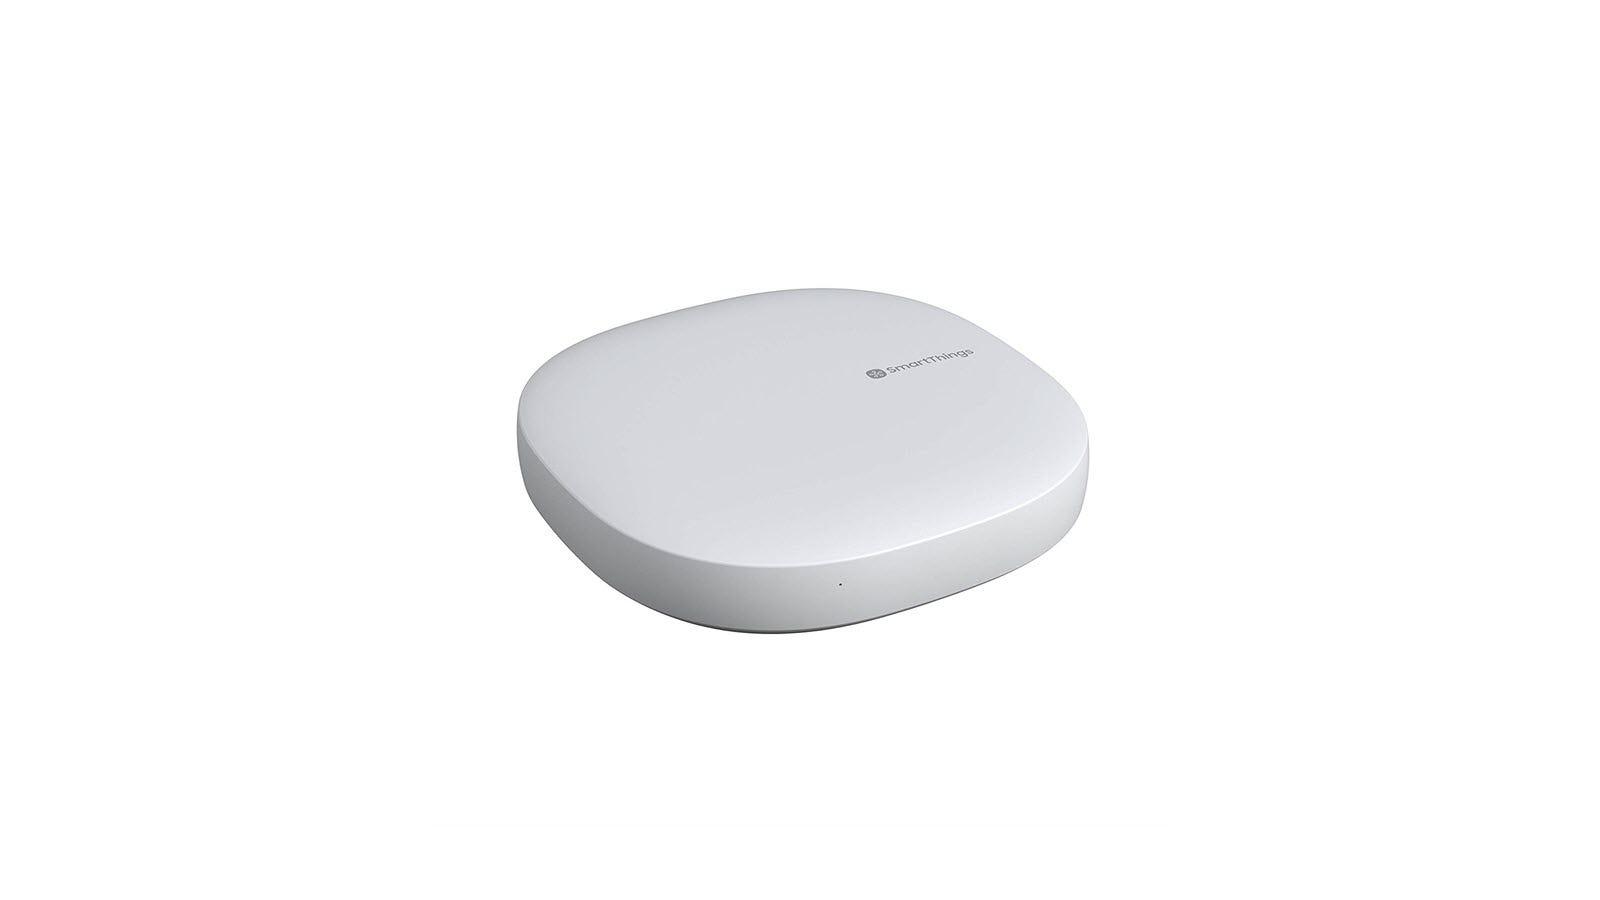 A white Samsung SmartThings hub